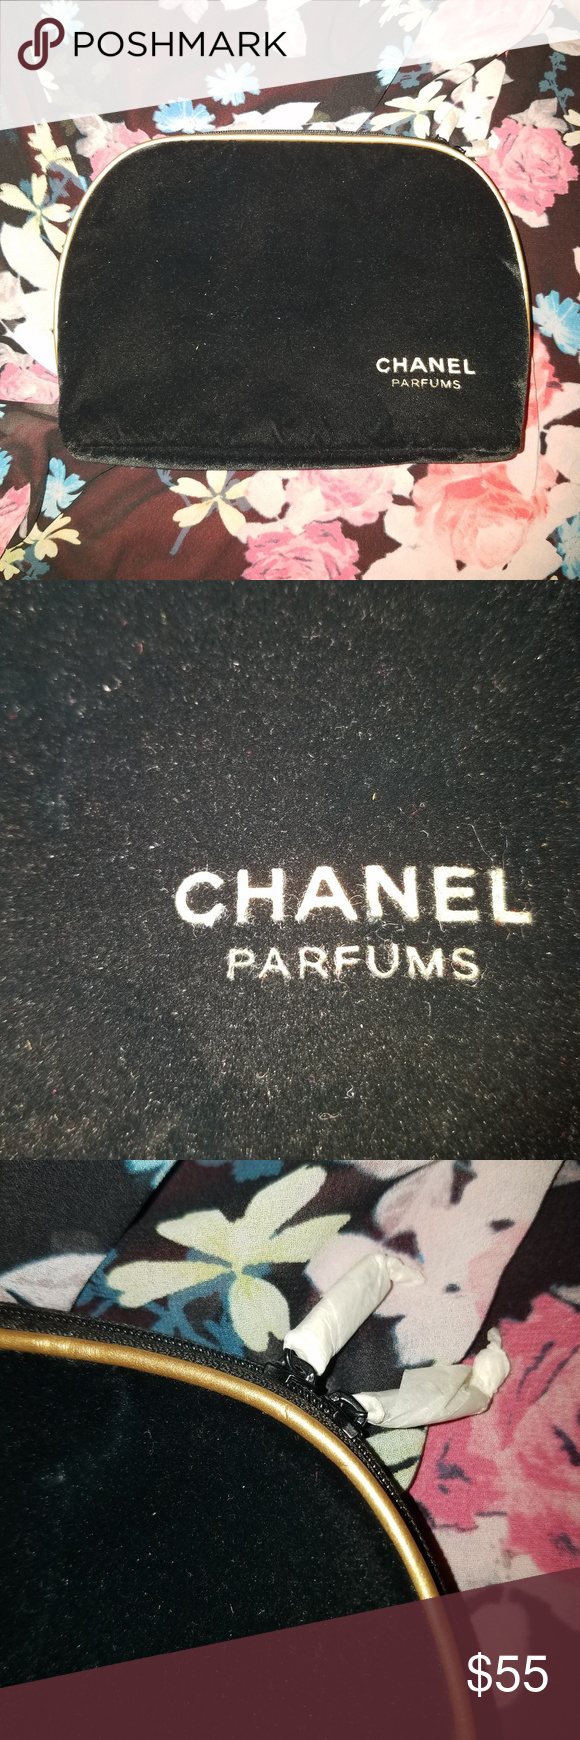 Chanel Parfums Black Velvet Makeup Travel Bag Makeup